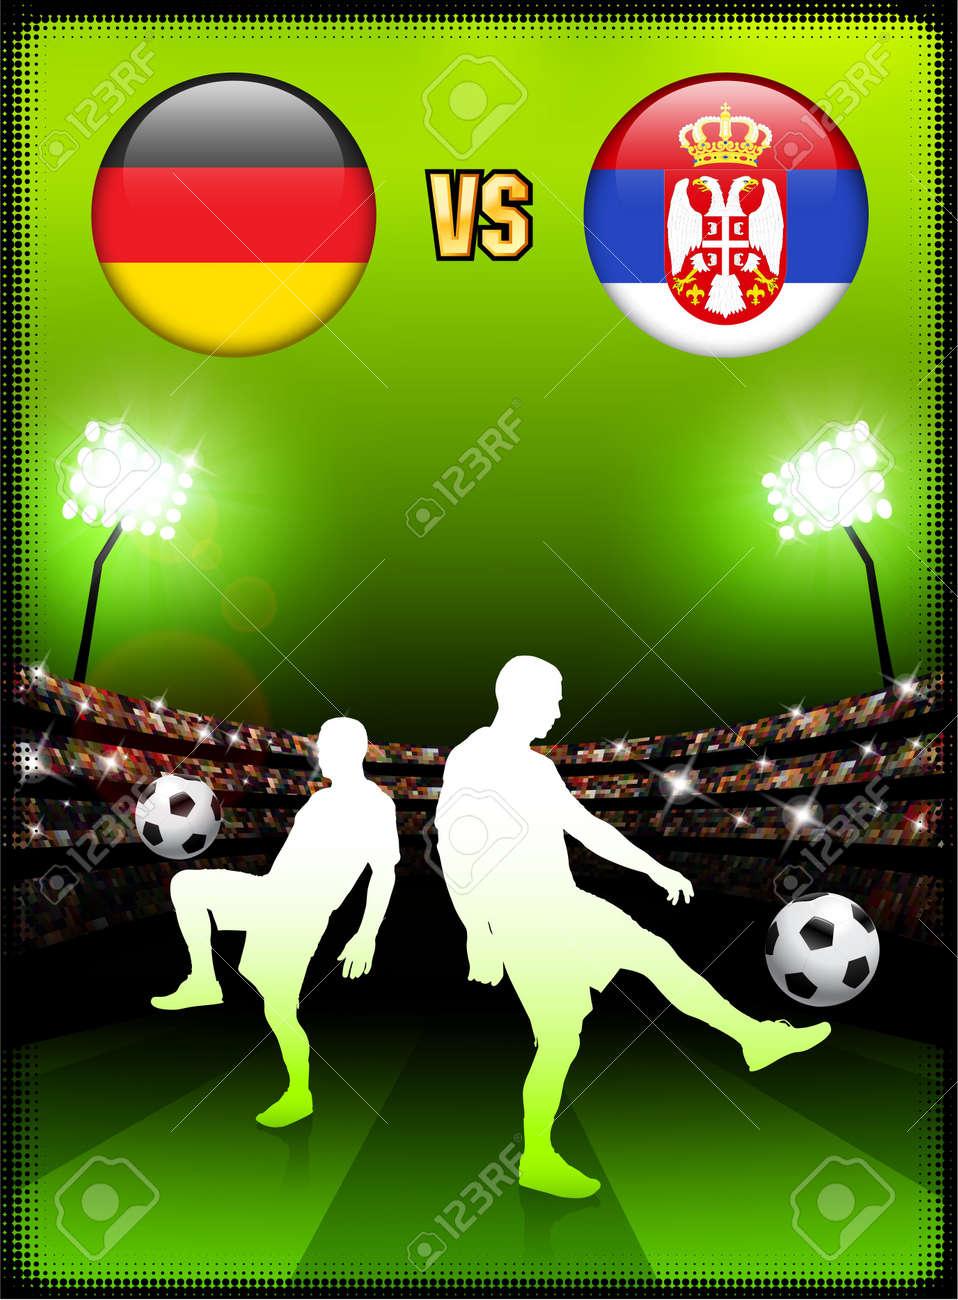 Germany versus Serbia on Stadium Event BackgroundOriginal Illustration Stock Photo - 7138235